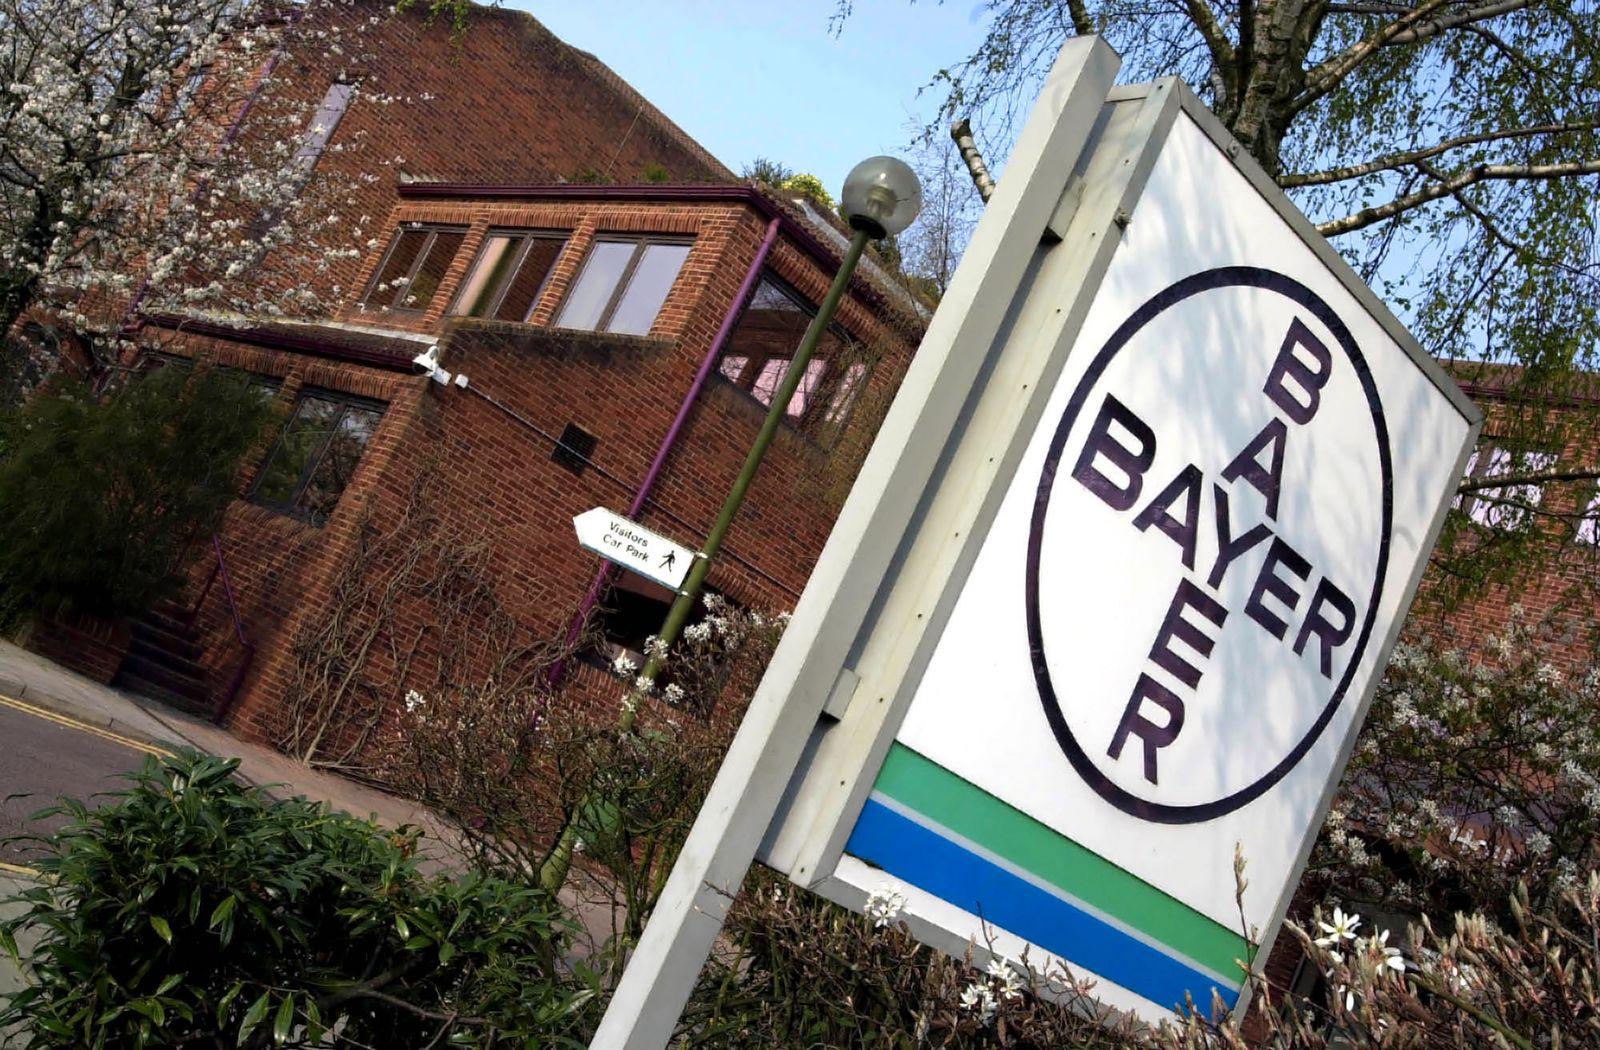 BAYER Zentrale England / Brexit / Pharma-Industrie